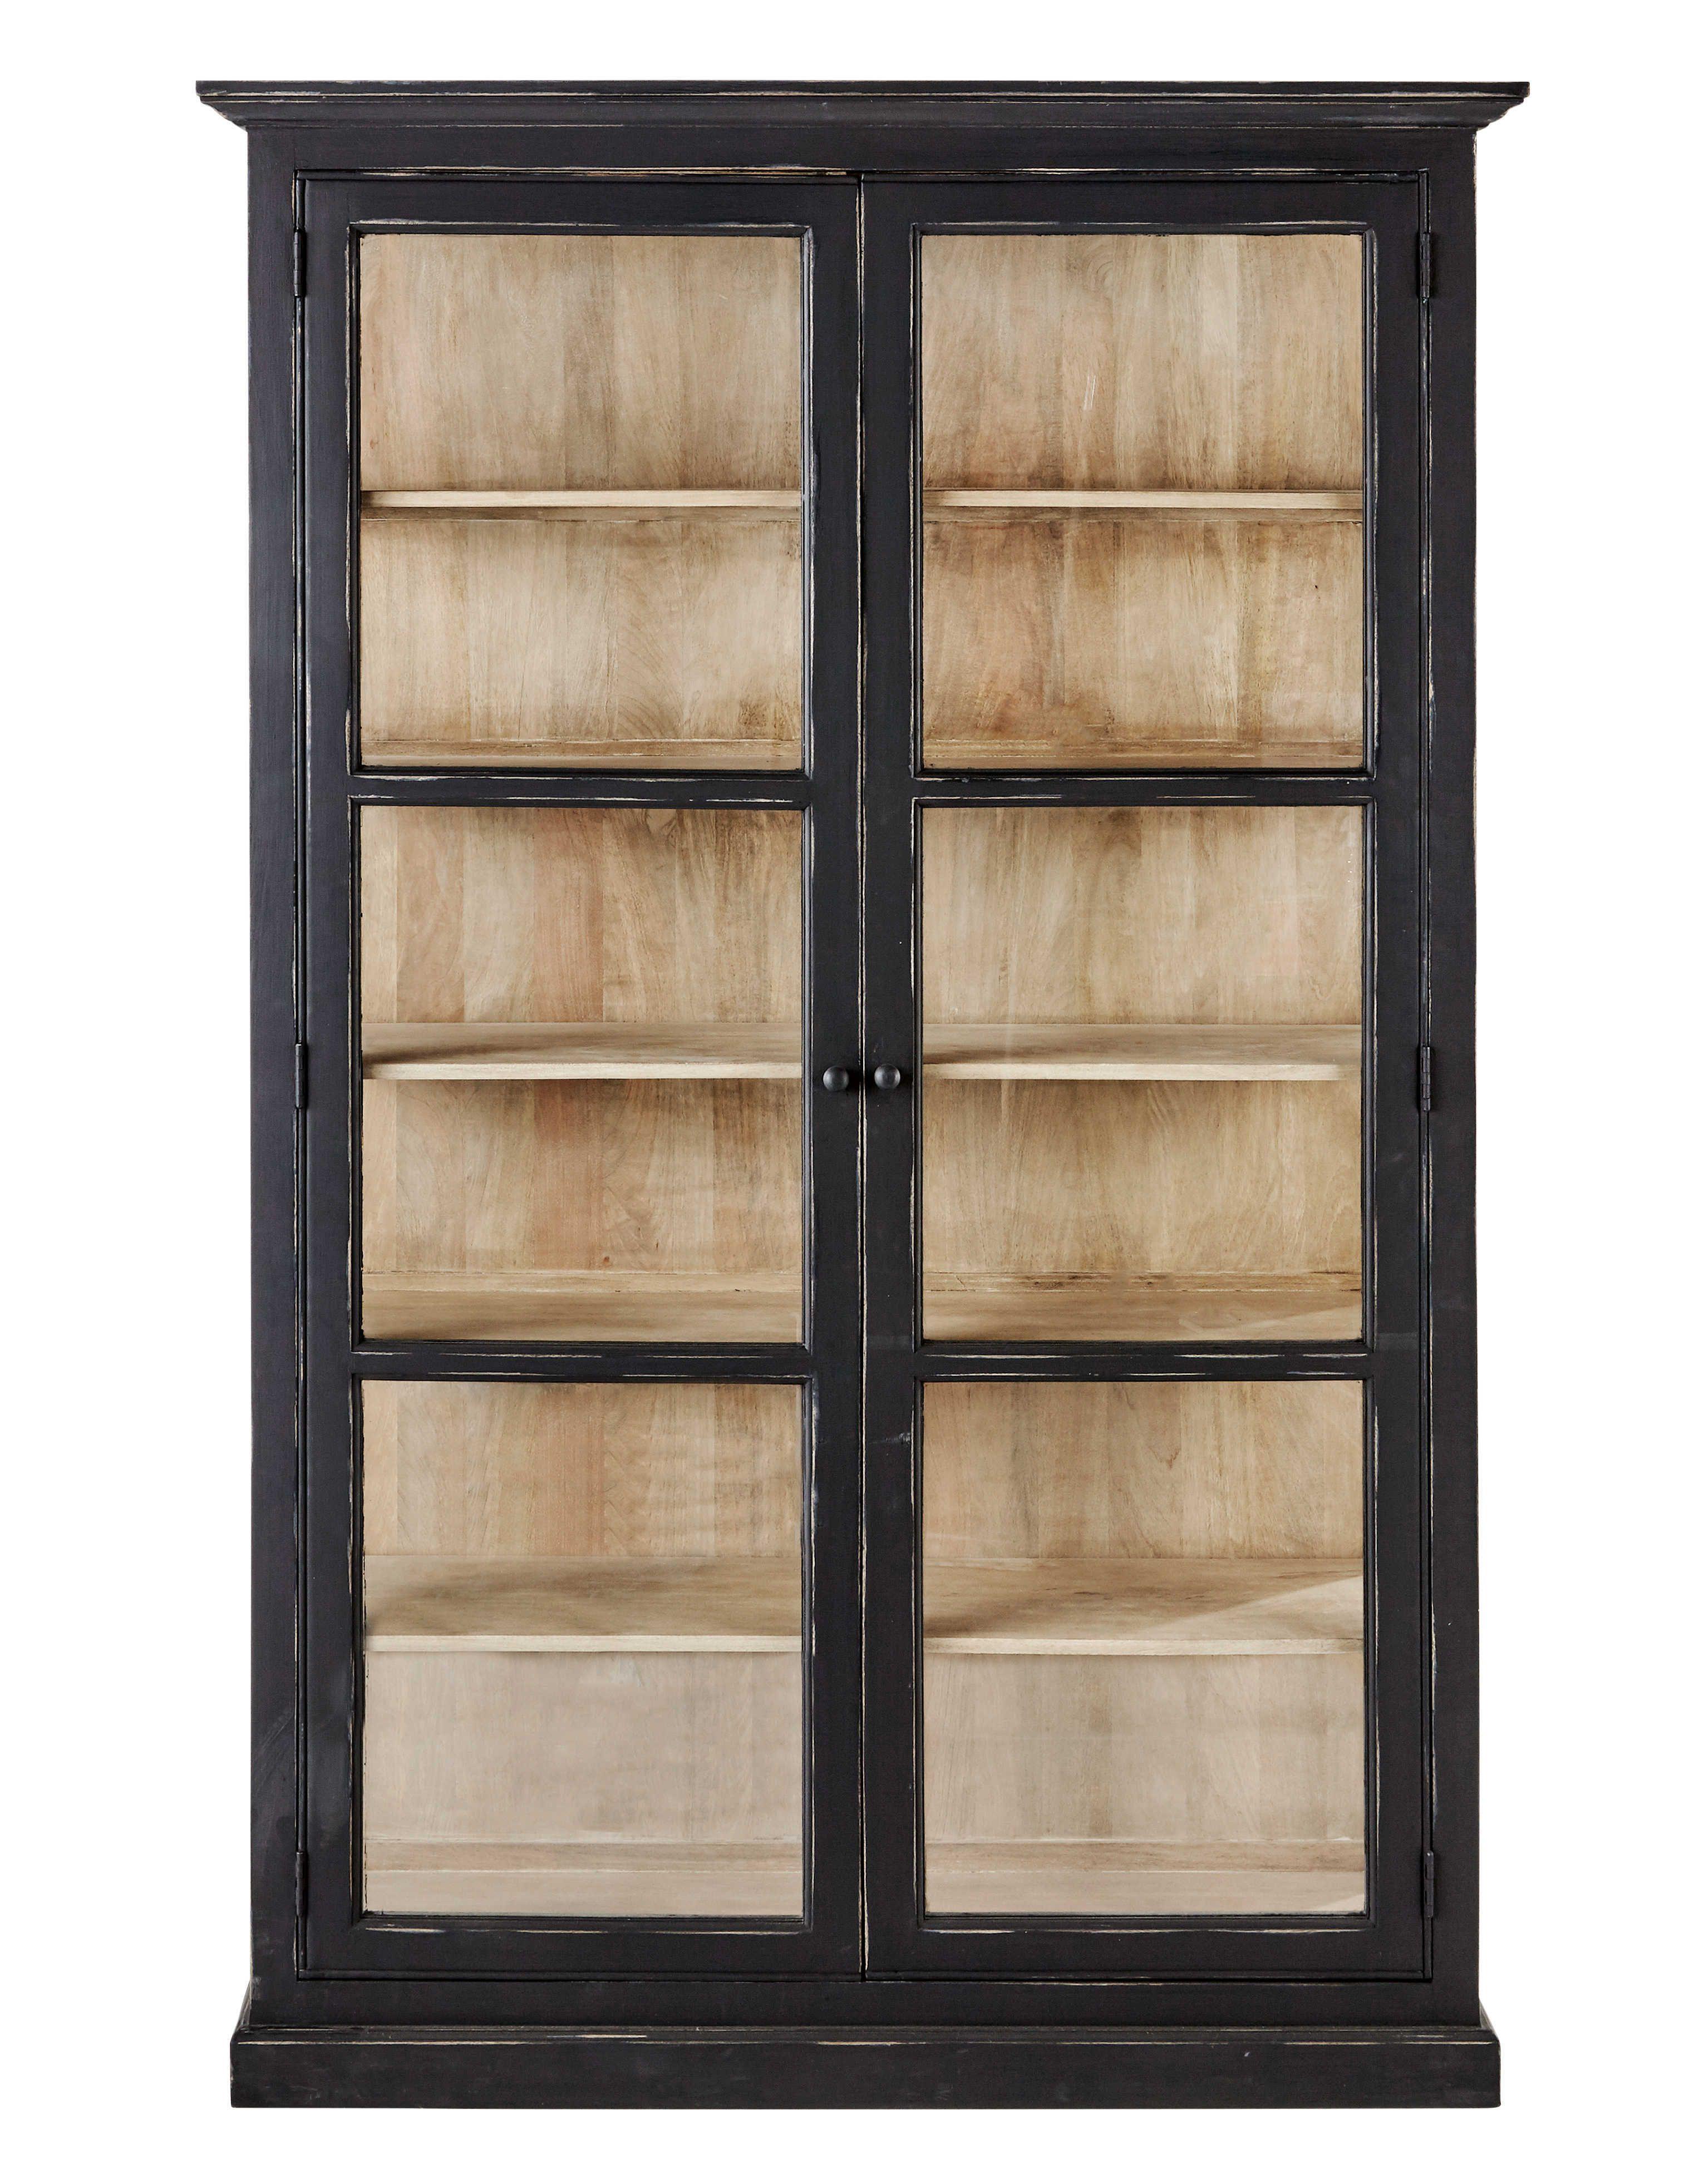 Vitrine En Manguier Noire Mat L 135 Cm Maisons Du Monde Kitchen Display Cabinet Wood Storage Cabinets Display Cabinet